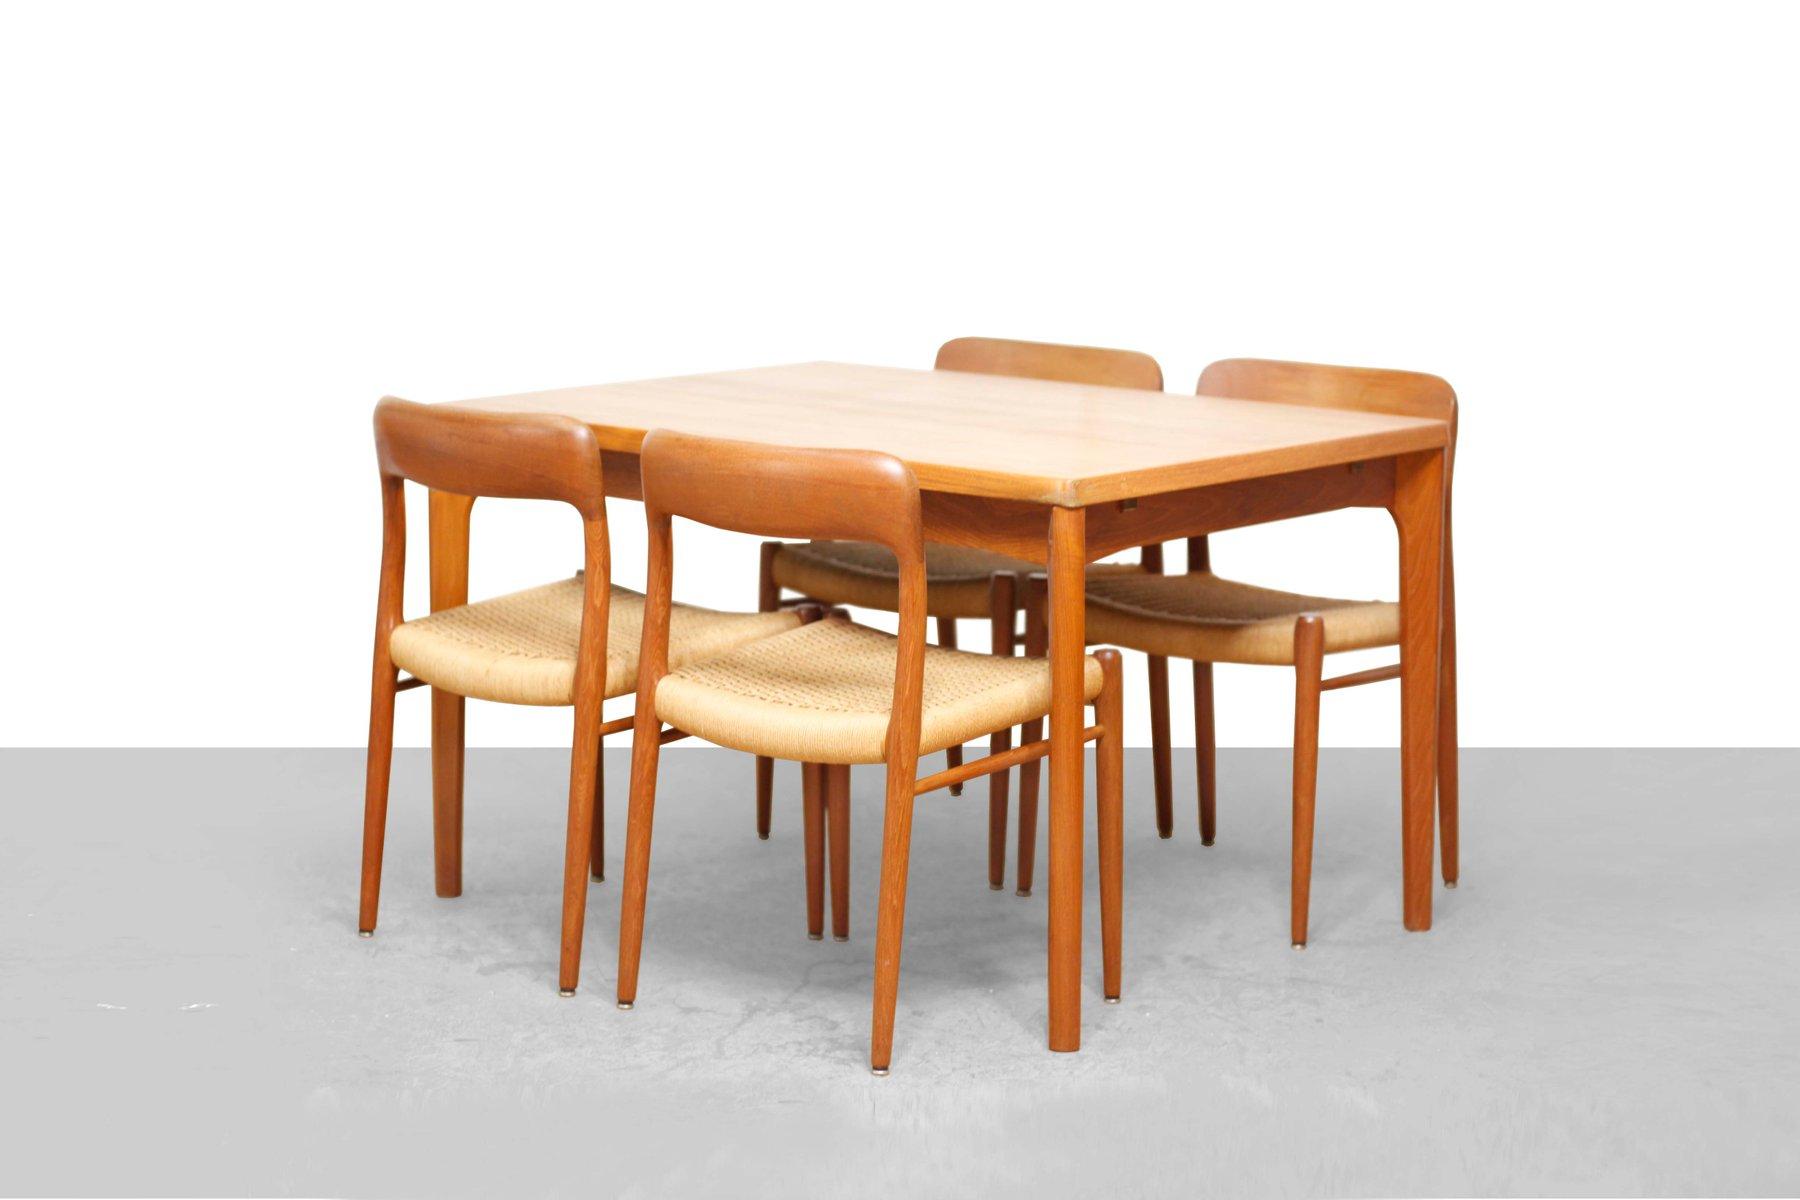 Danish Modern Teak Dining Table by Henning Kj230rnulf for  : danish modern teak dining table by henning kjaernulf for vejle 1960s 4 from www.pamono.eu size 1800 x 1200 jpeg 87kB